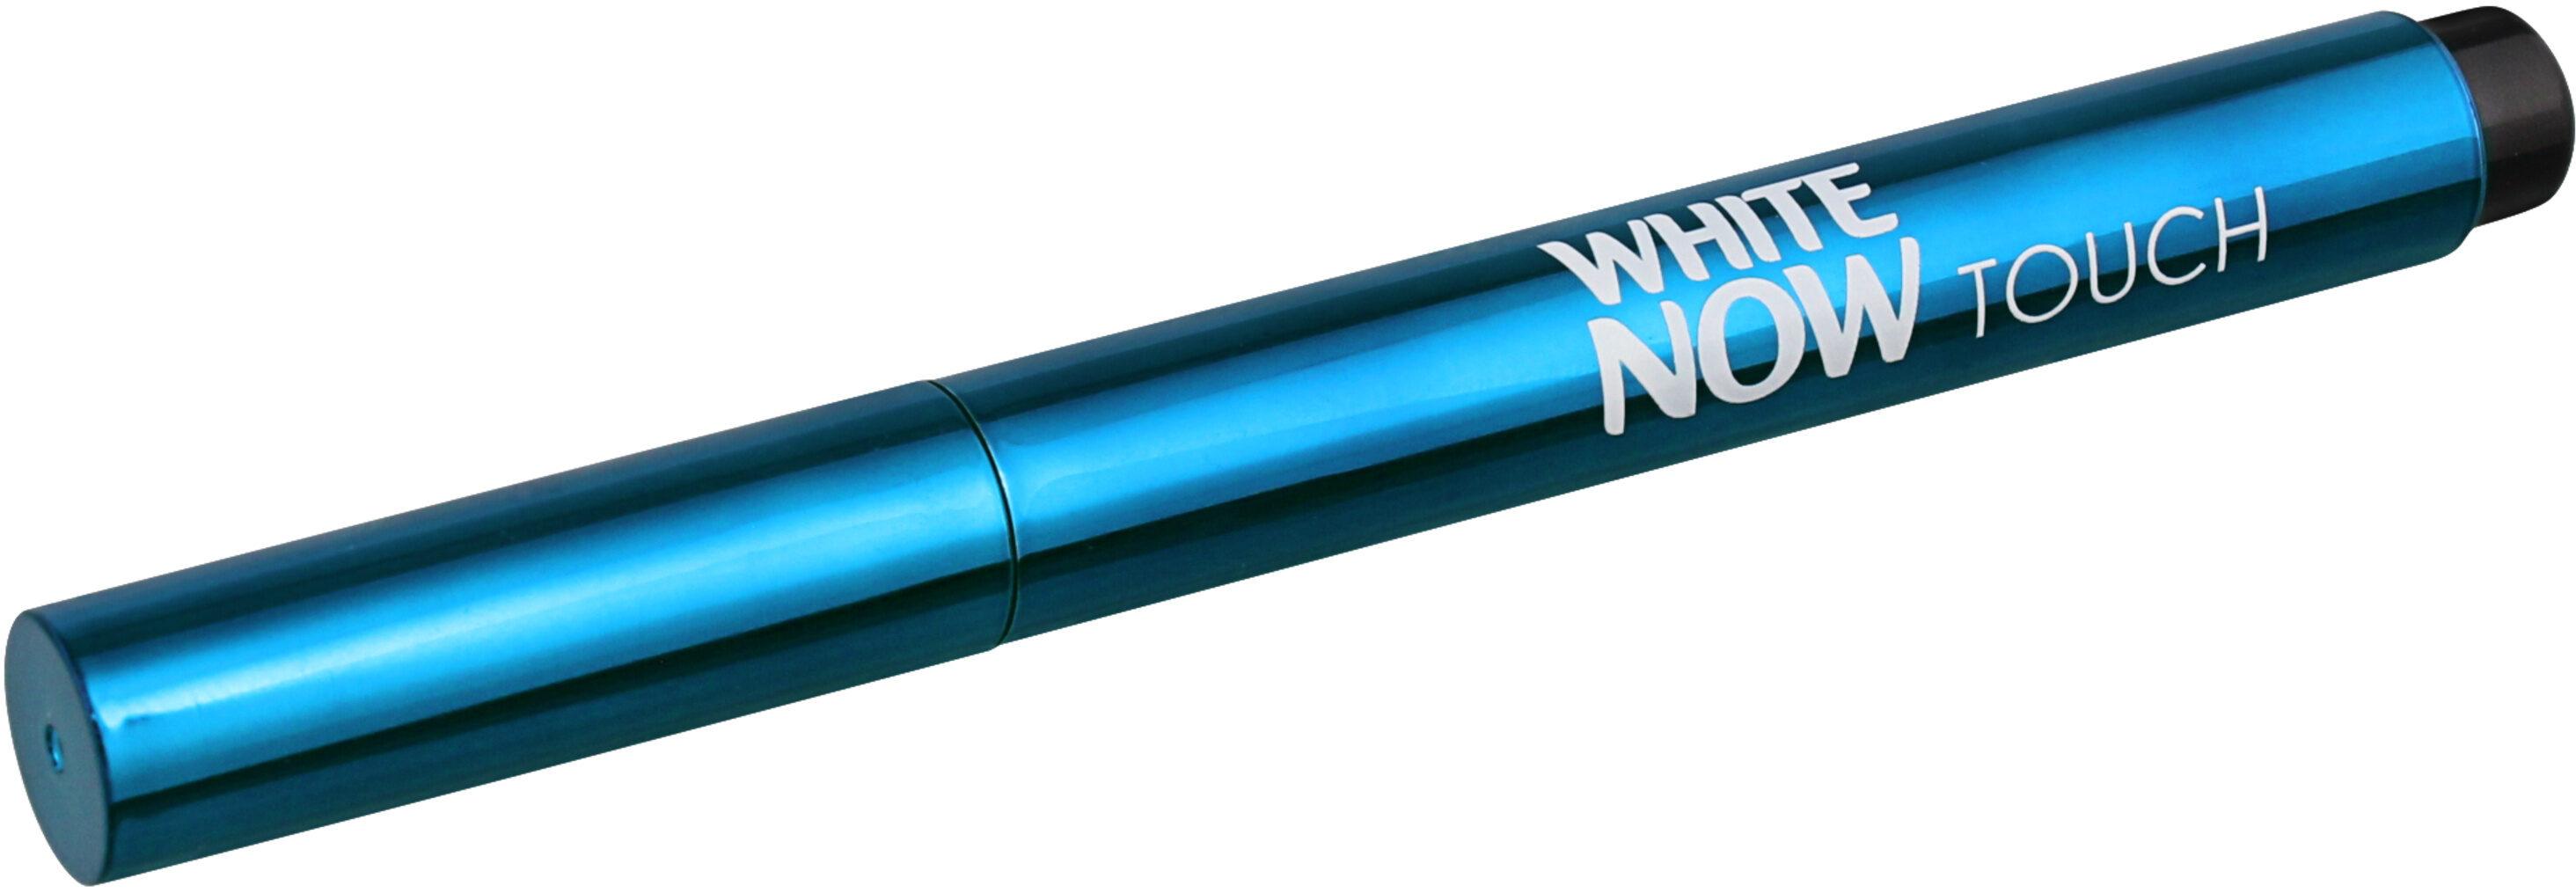 Signal Stylo Blancheur pour les Dents White Now x1 - Product - fr